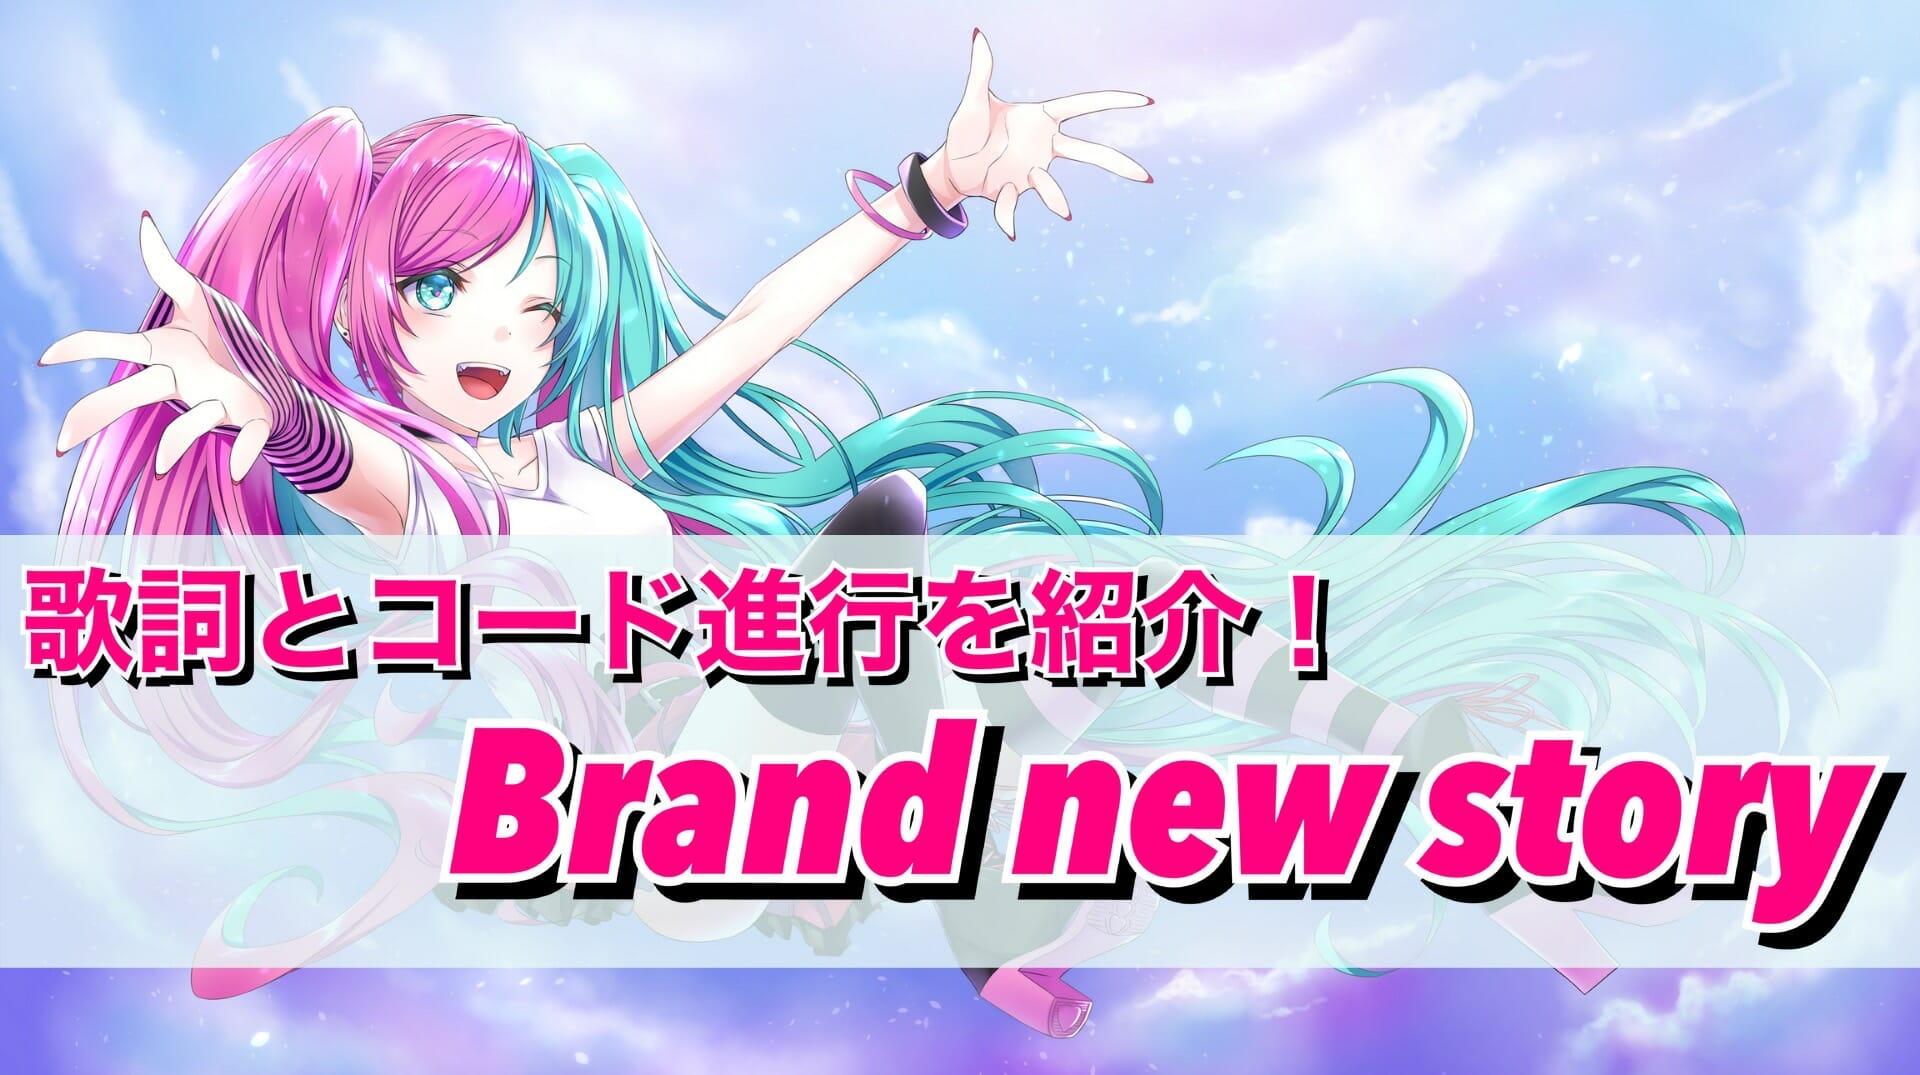 「Brand new story」の歌詞とコード進行を紹介!